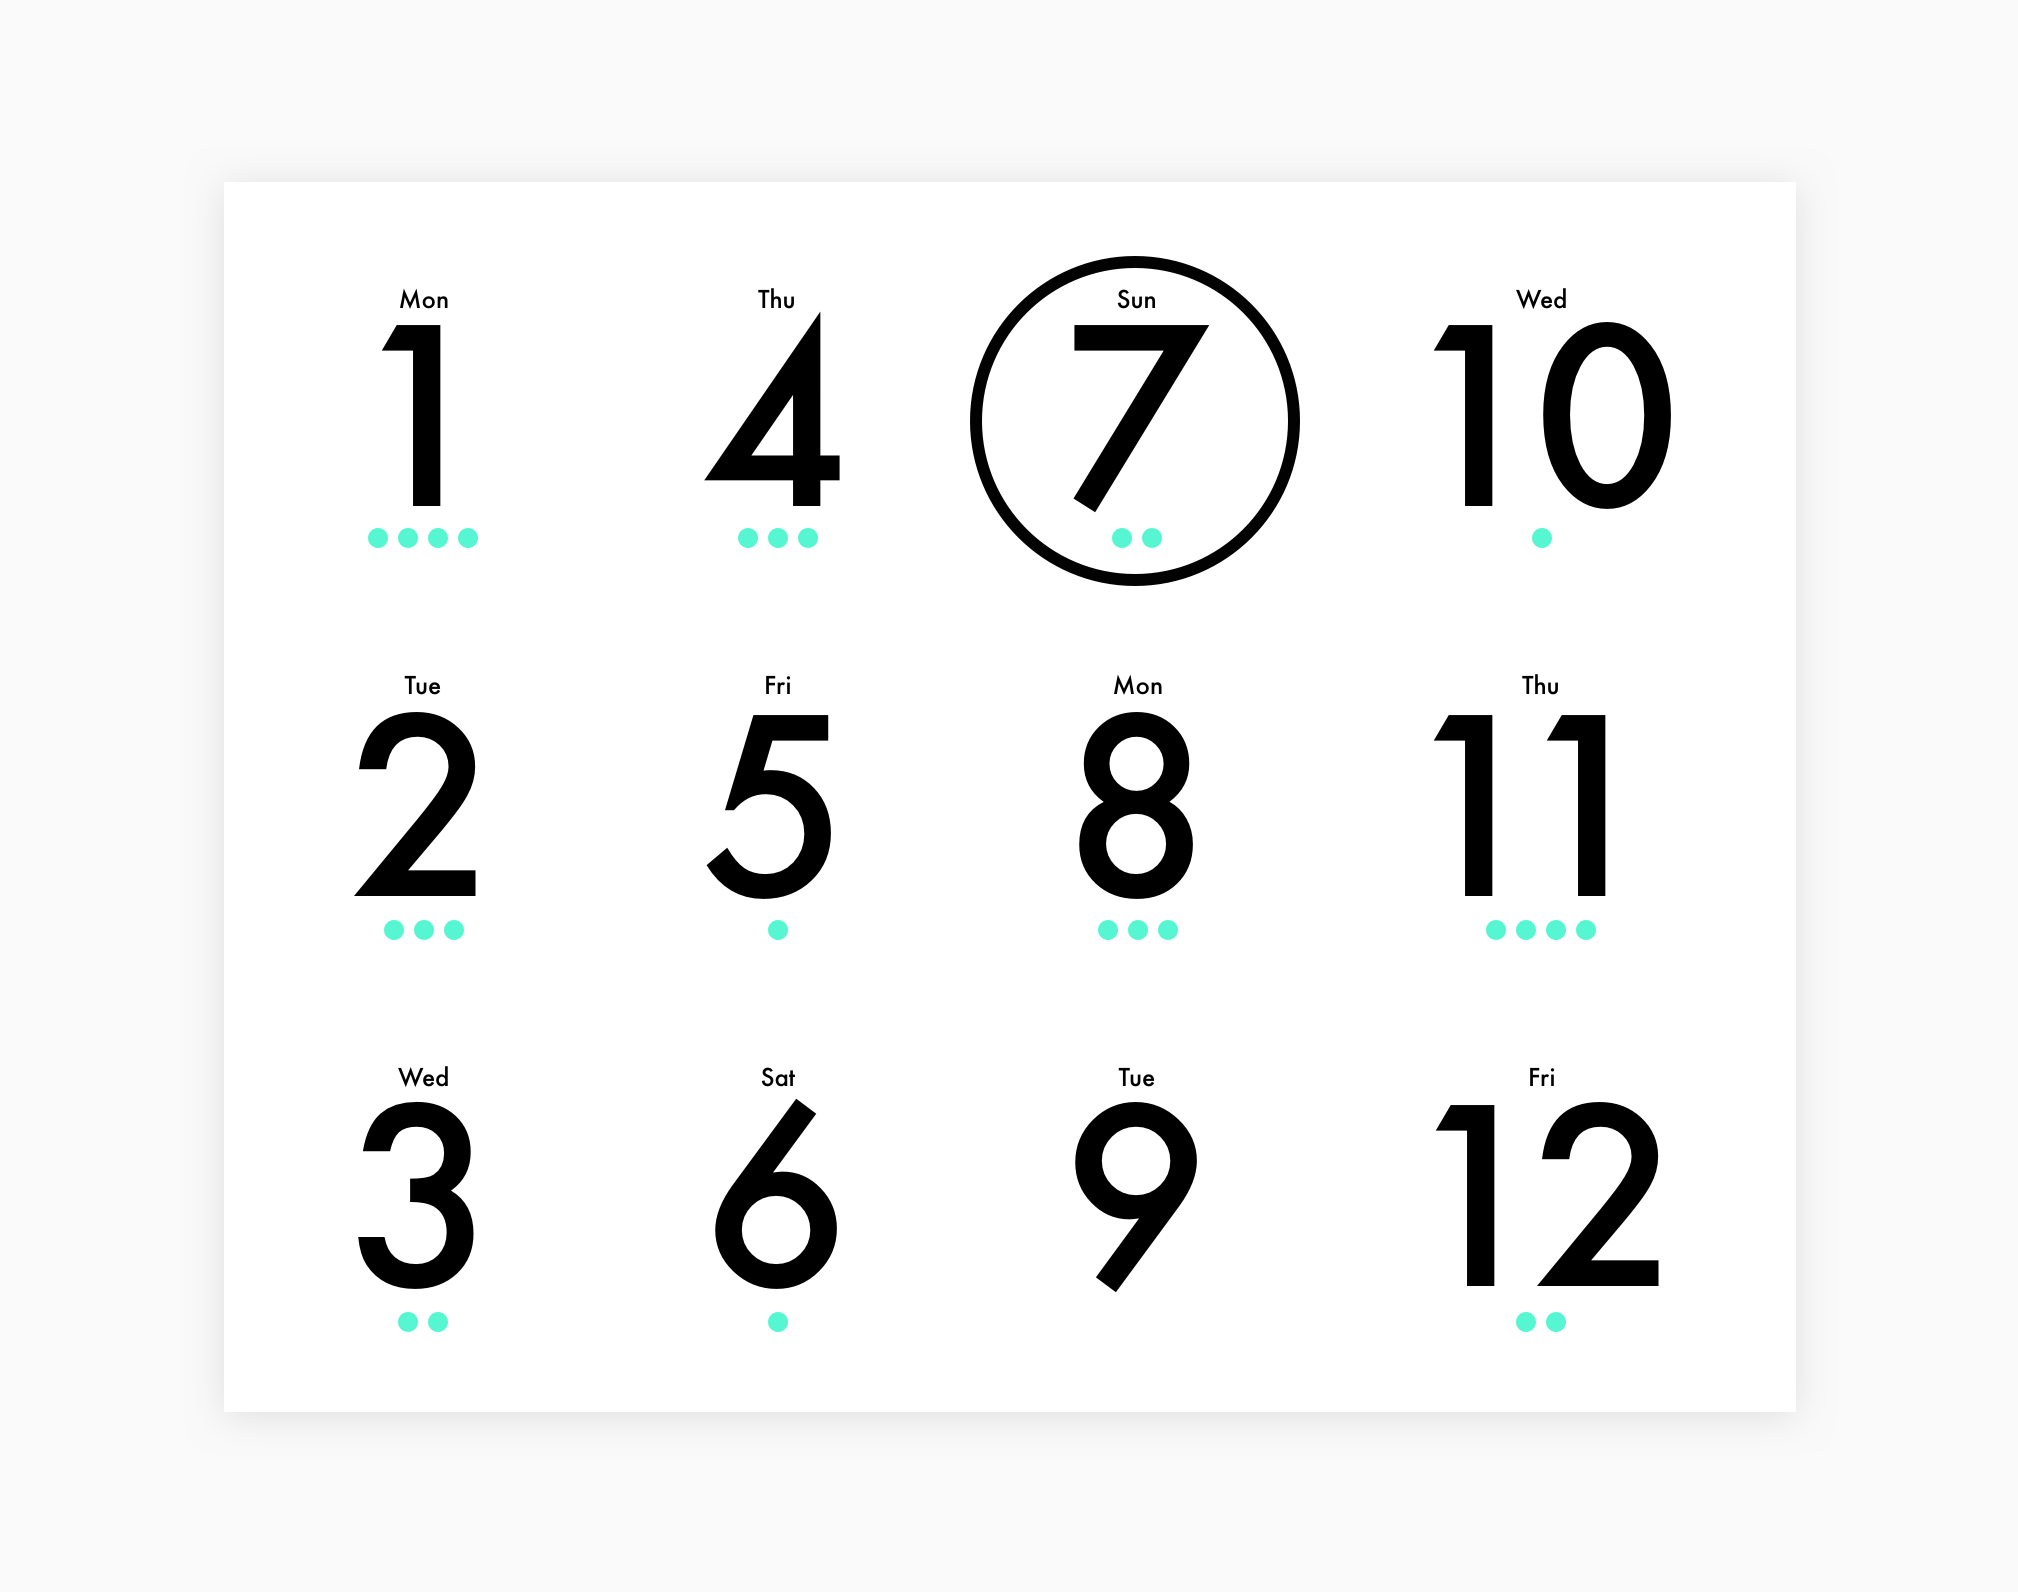 Day 38 B Calendar@2x.png